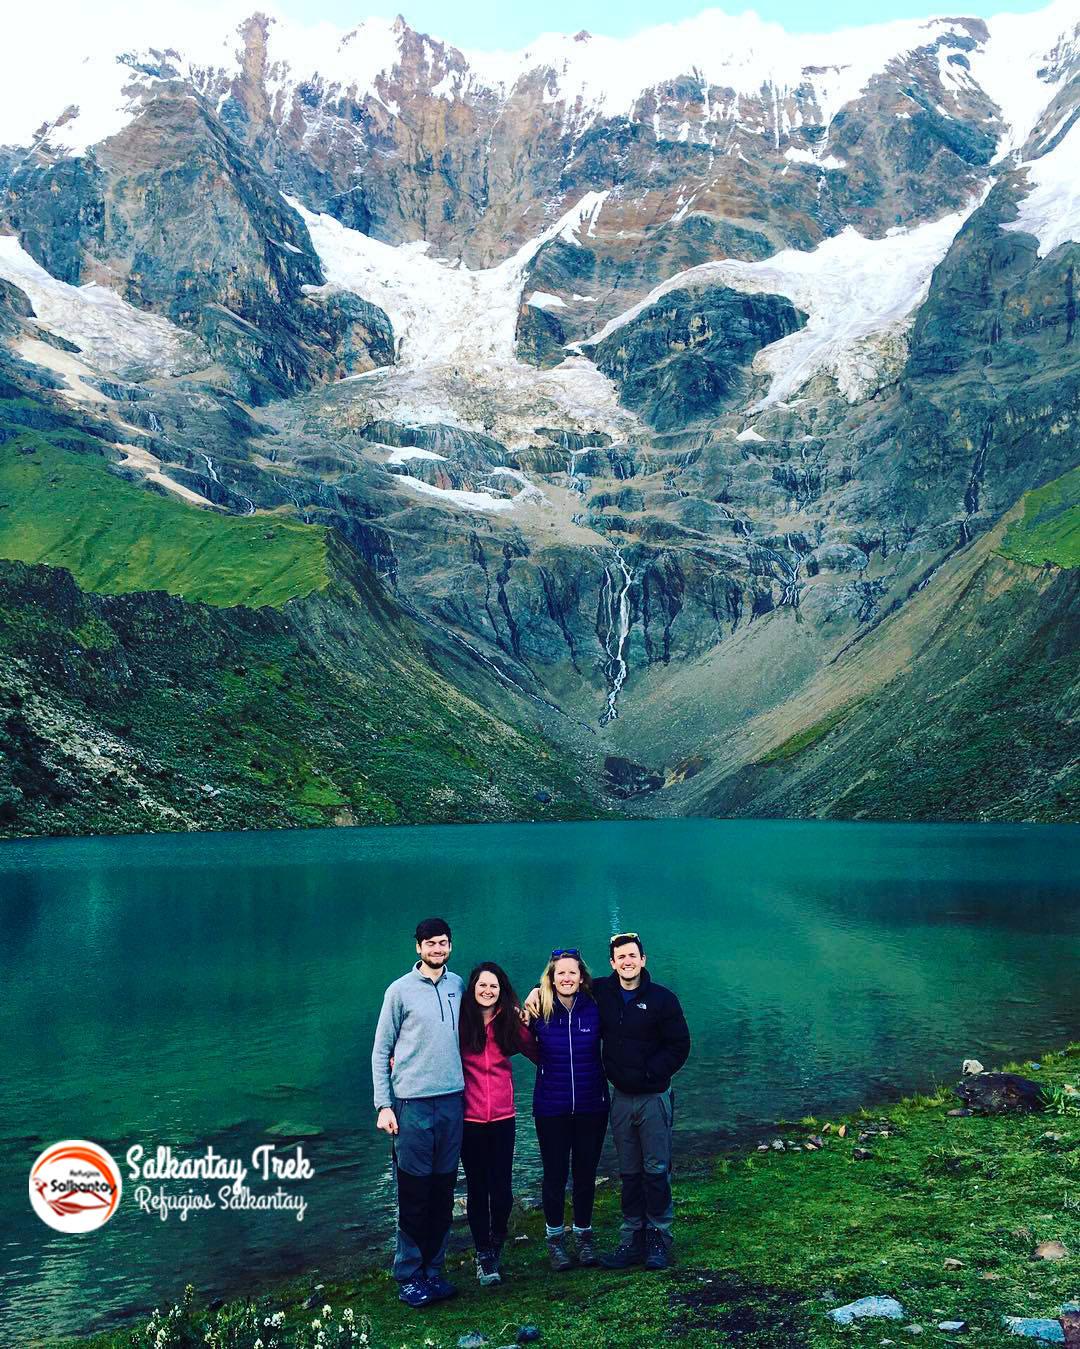 Salkantay Trek - Refugios Salkantay - Soray